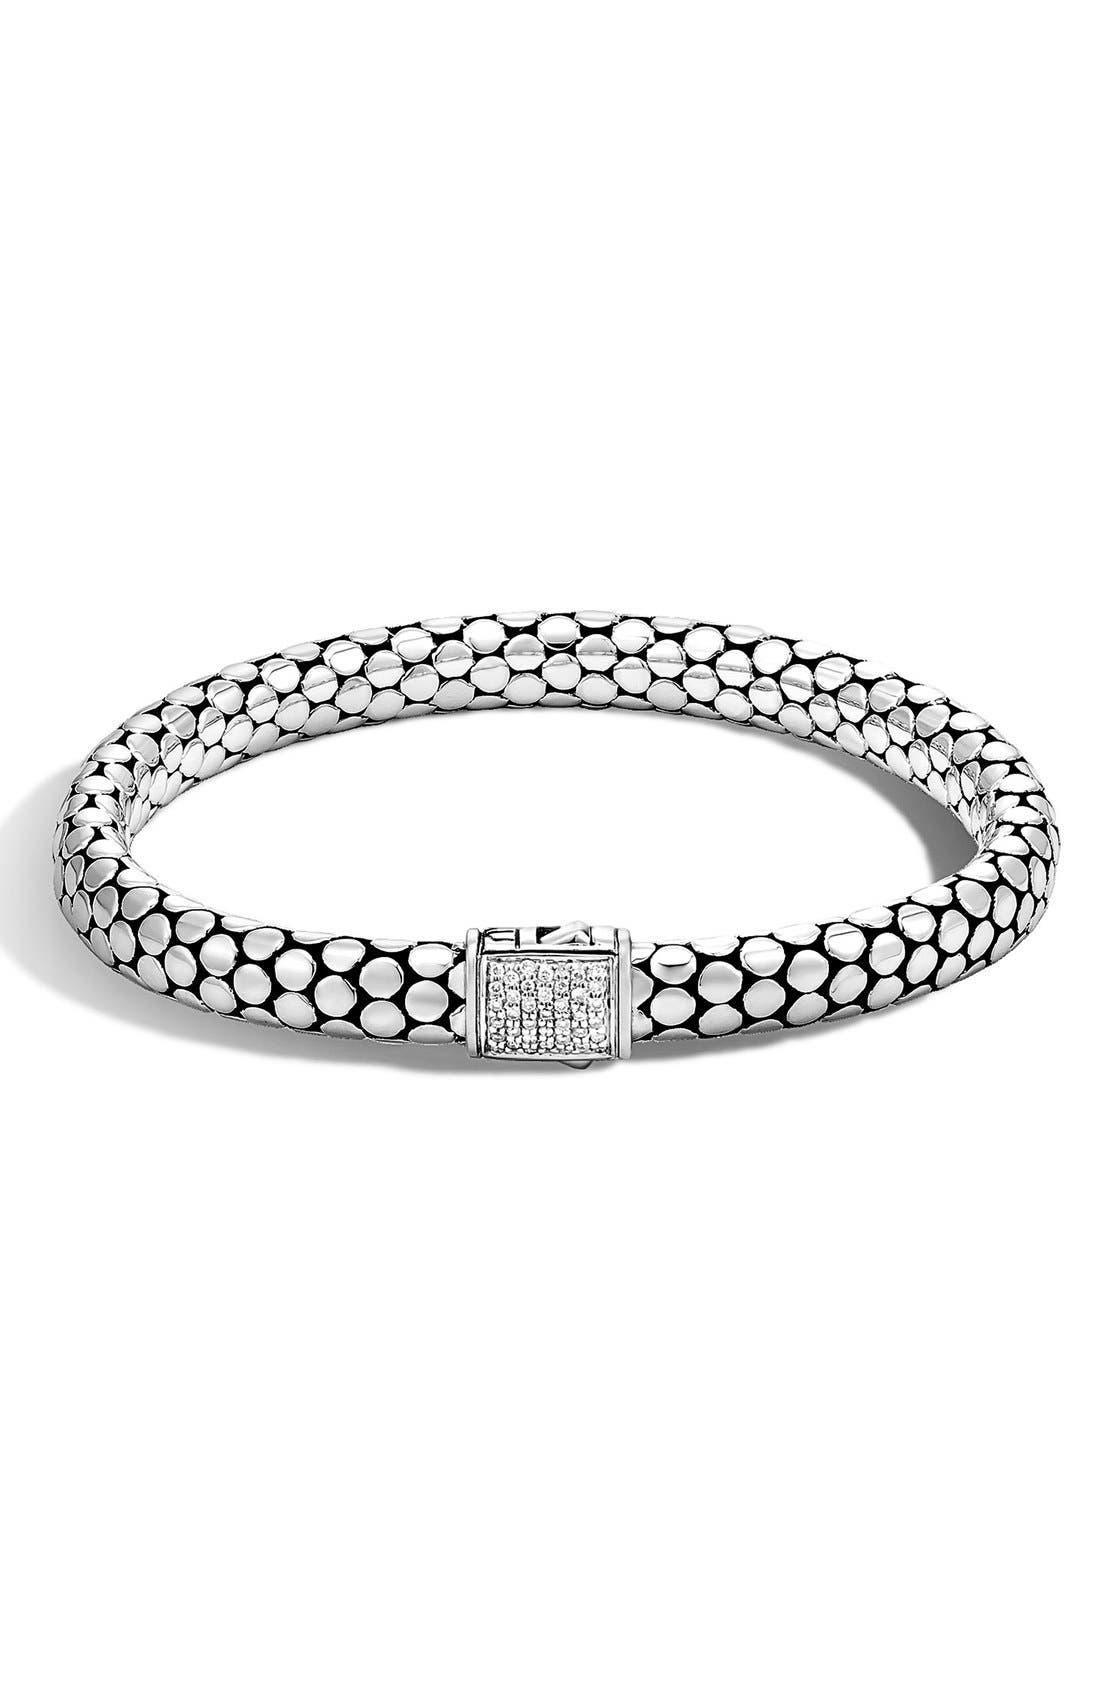 Main Image - John Hardy 'Dot' Small Diamond Bracelet